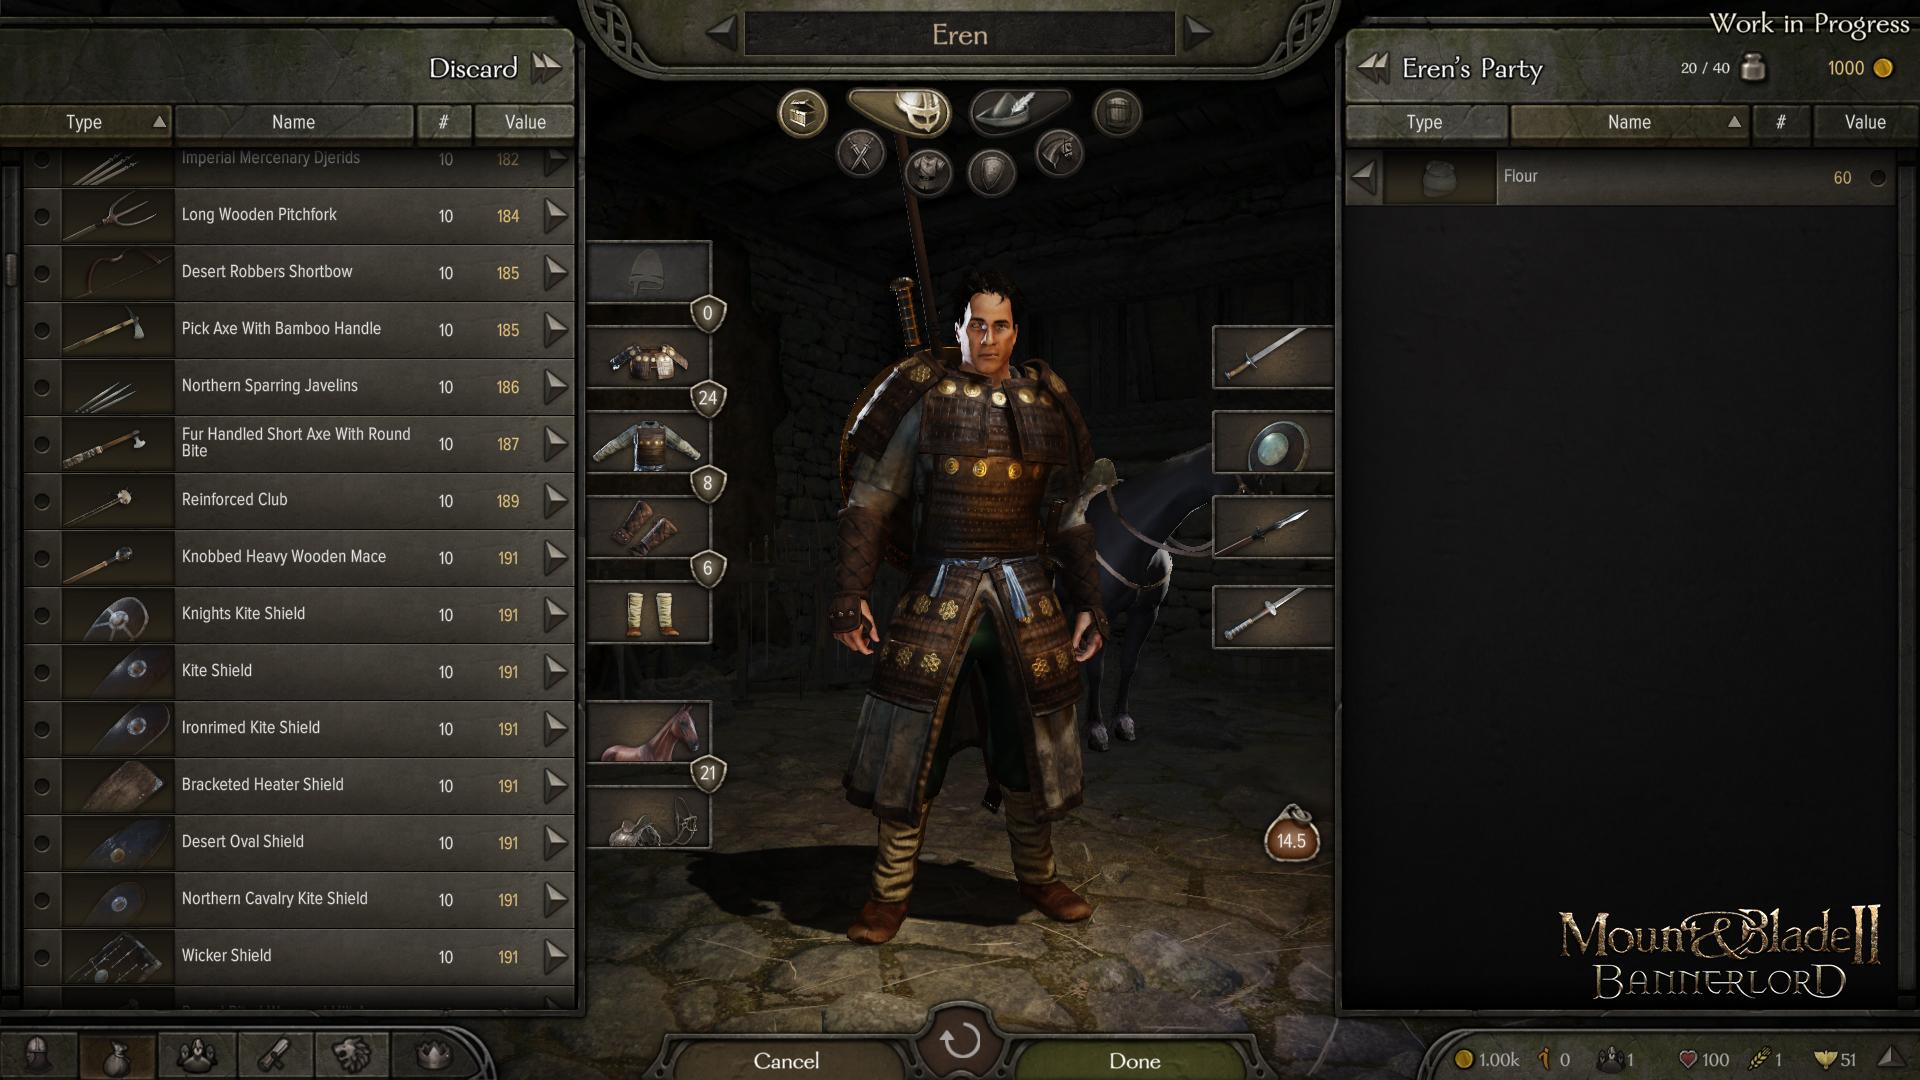 Инвентарь - Mount & Blade 2: Bannerlord